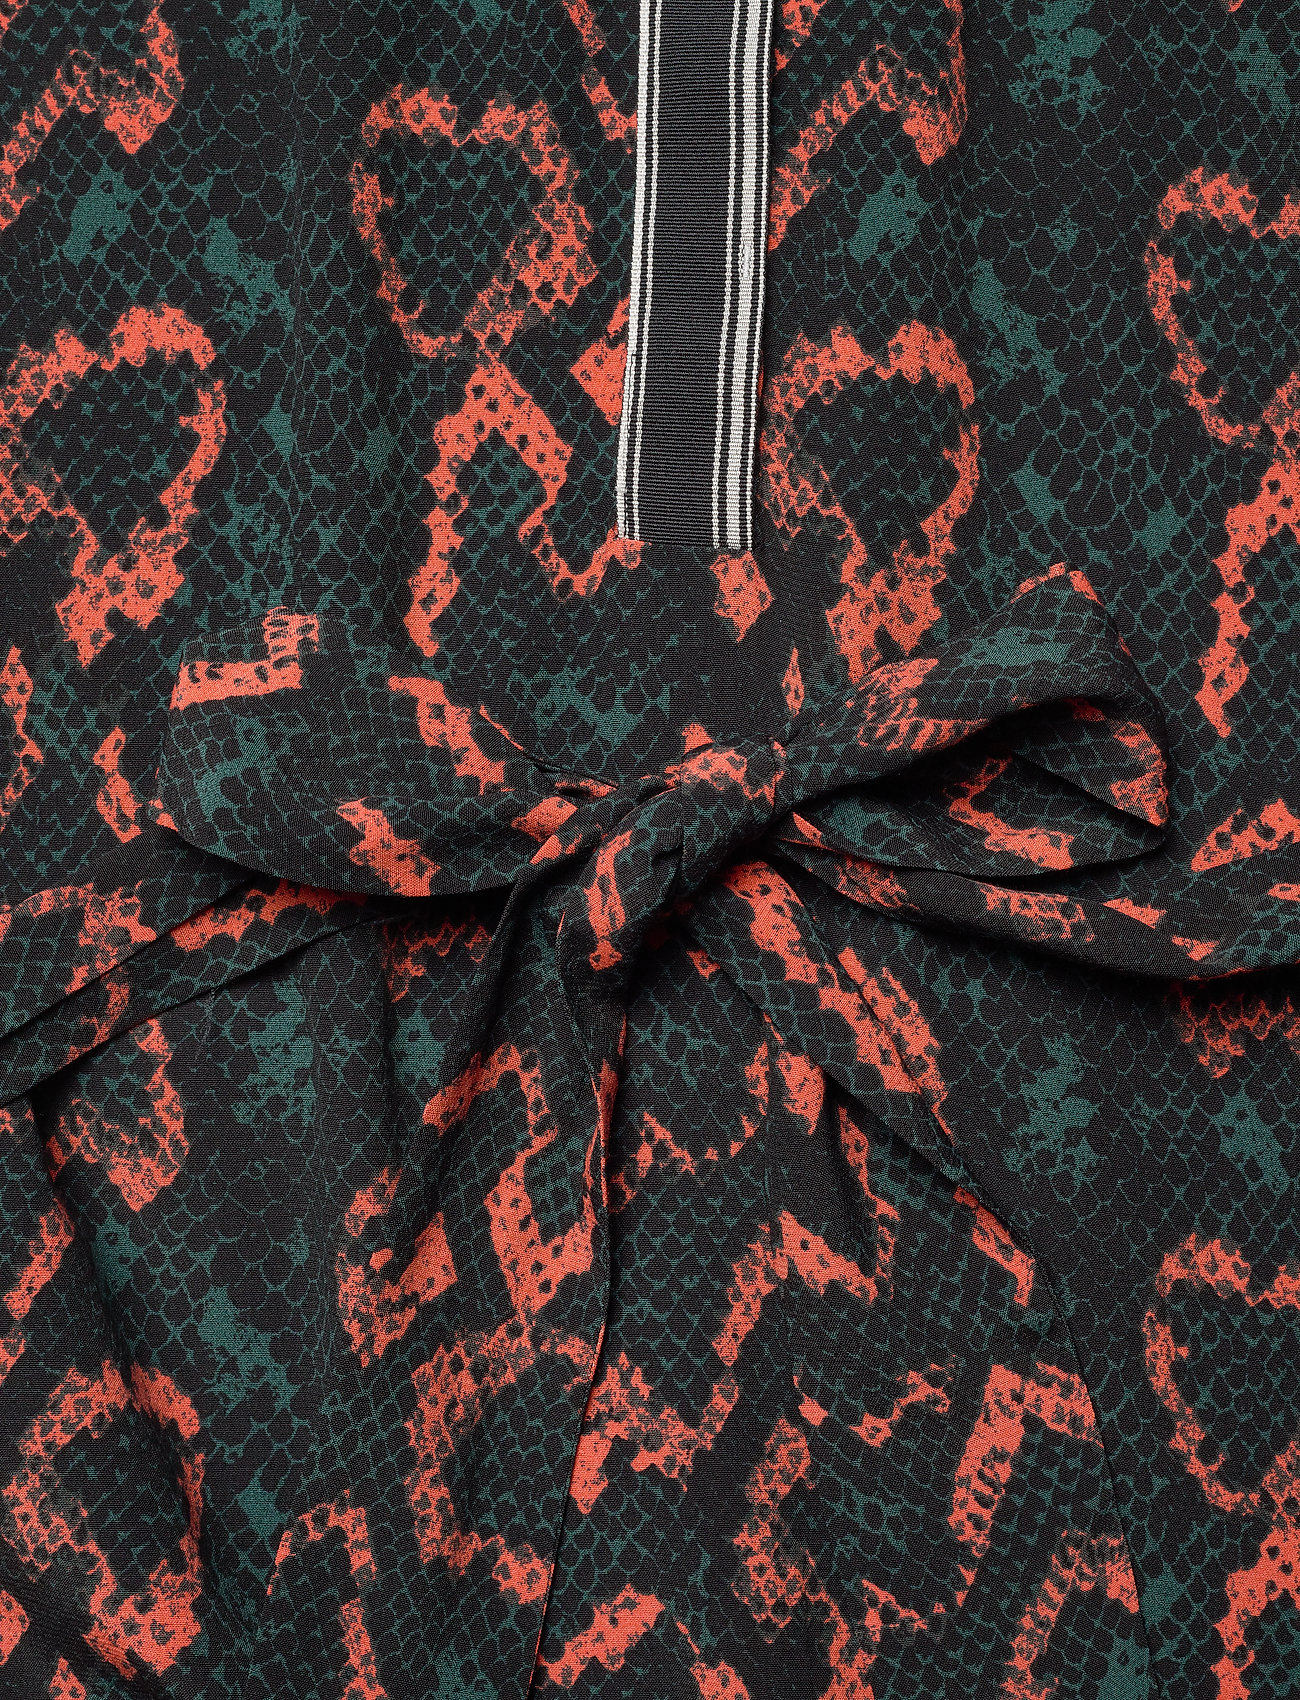 Prt Belted Ls Placket Dress (Python - Chemise / Black) (1020 kr) - Calvin Klein